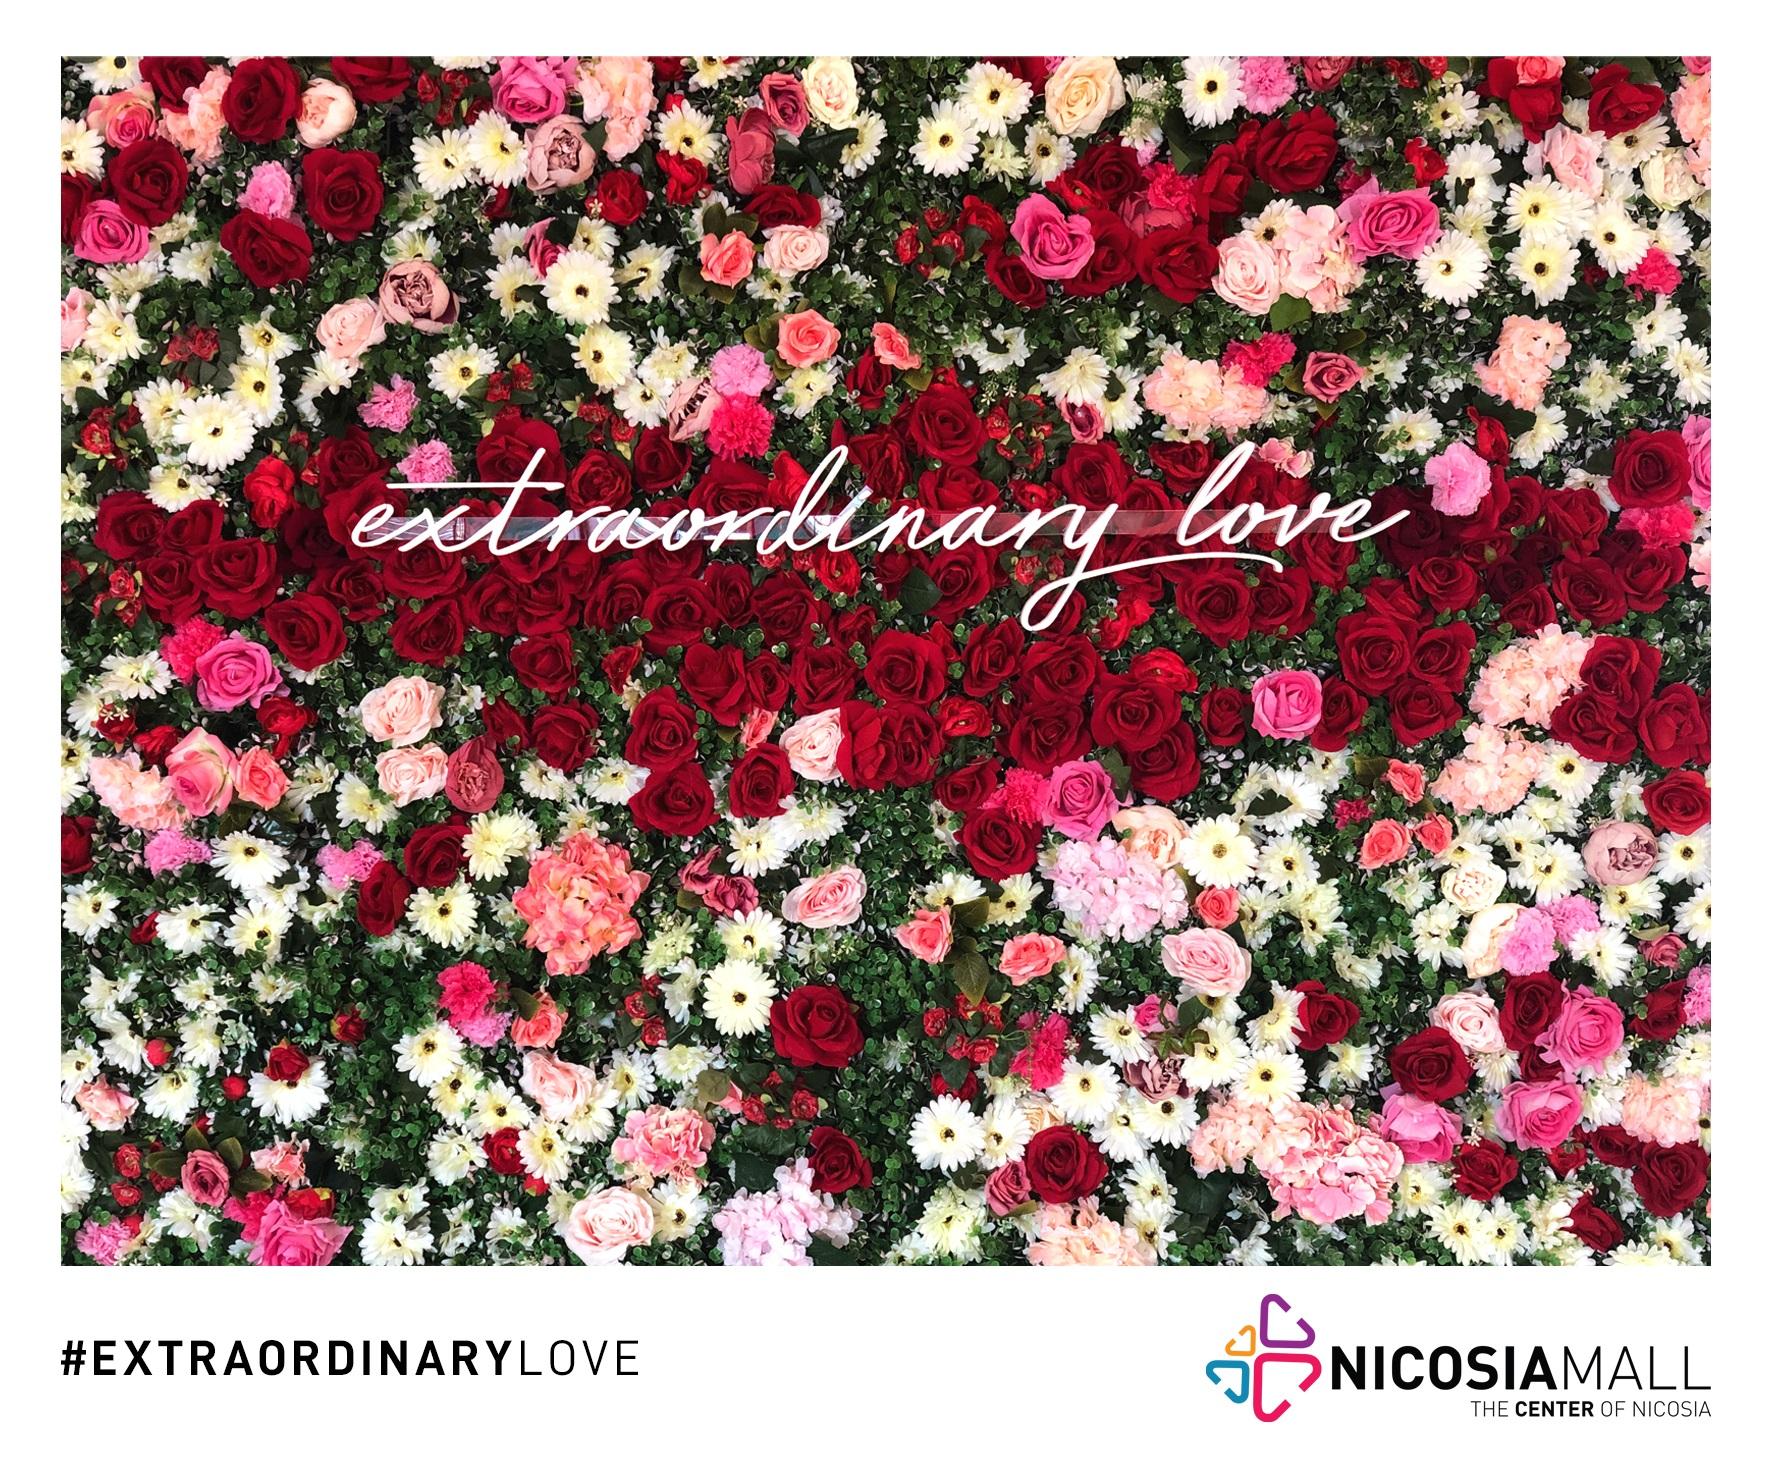 EXTRAORDINARY LOVE PRESS RELEASE[3]